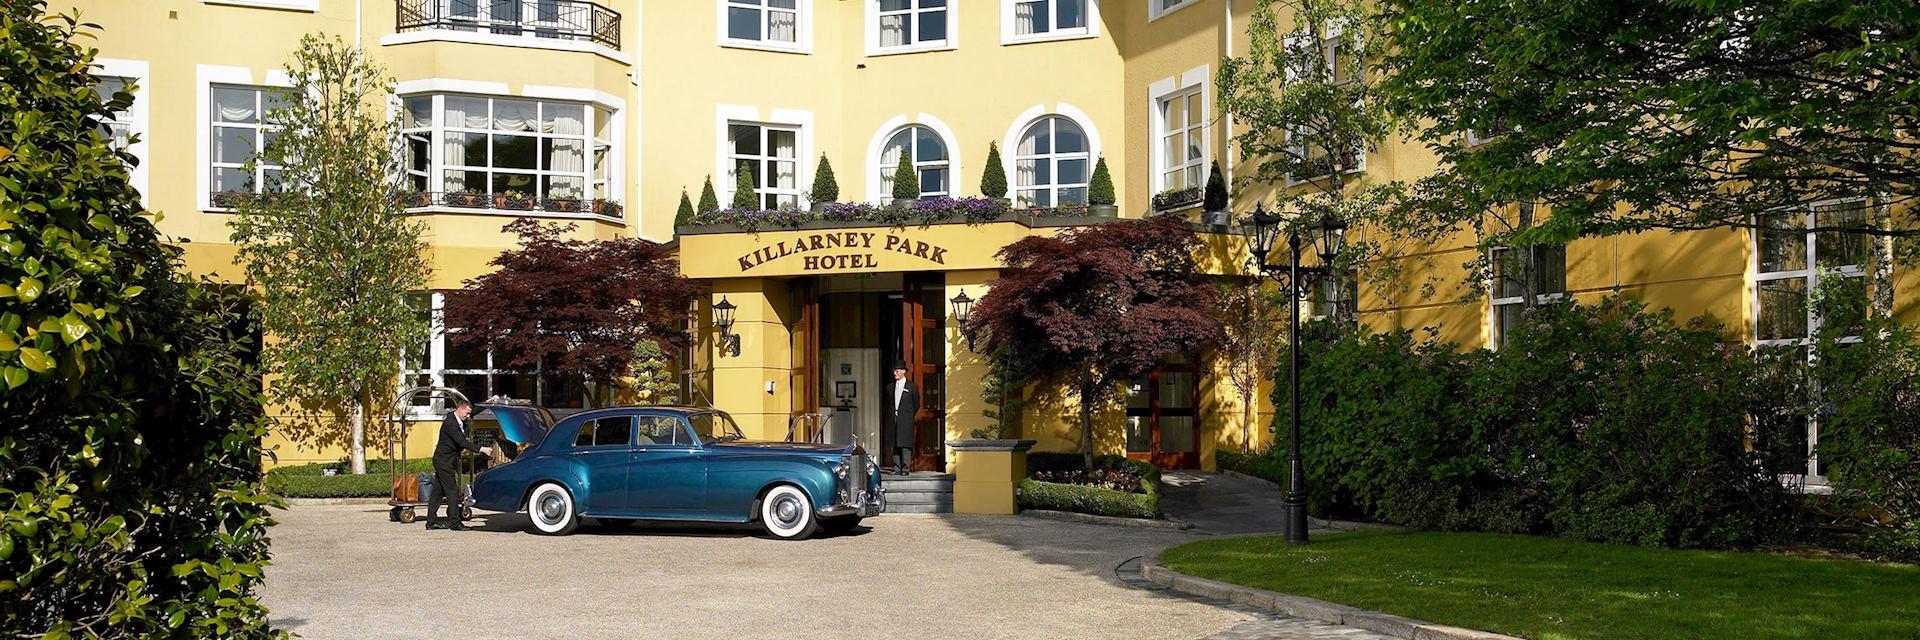 Killarney Park Hotel, killarney